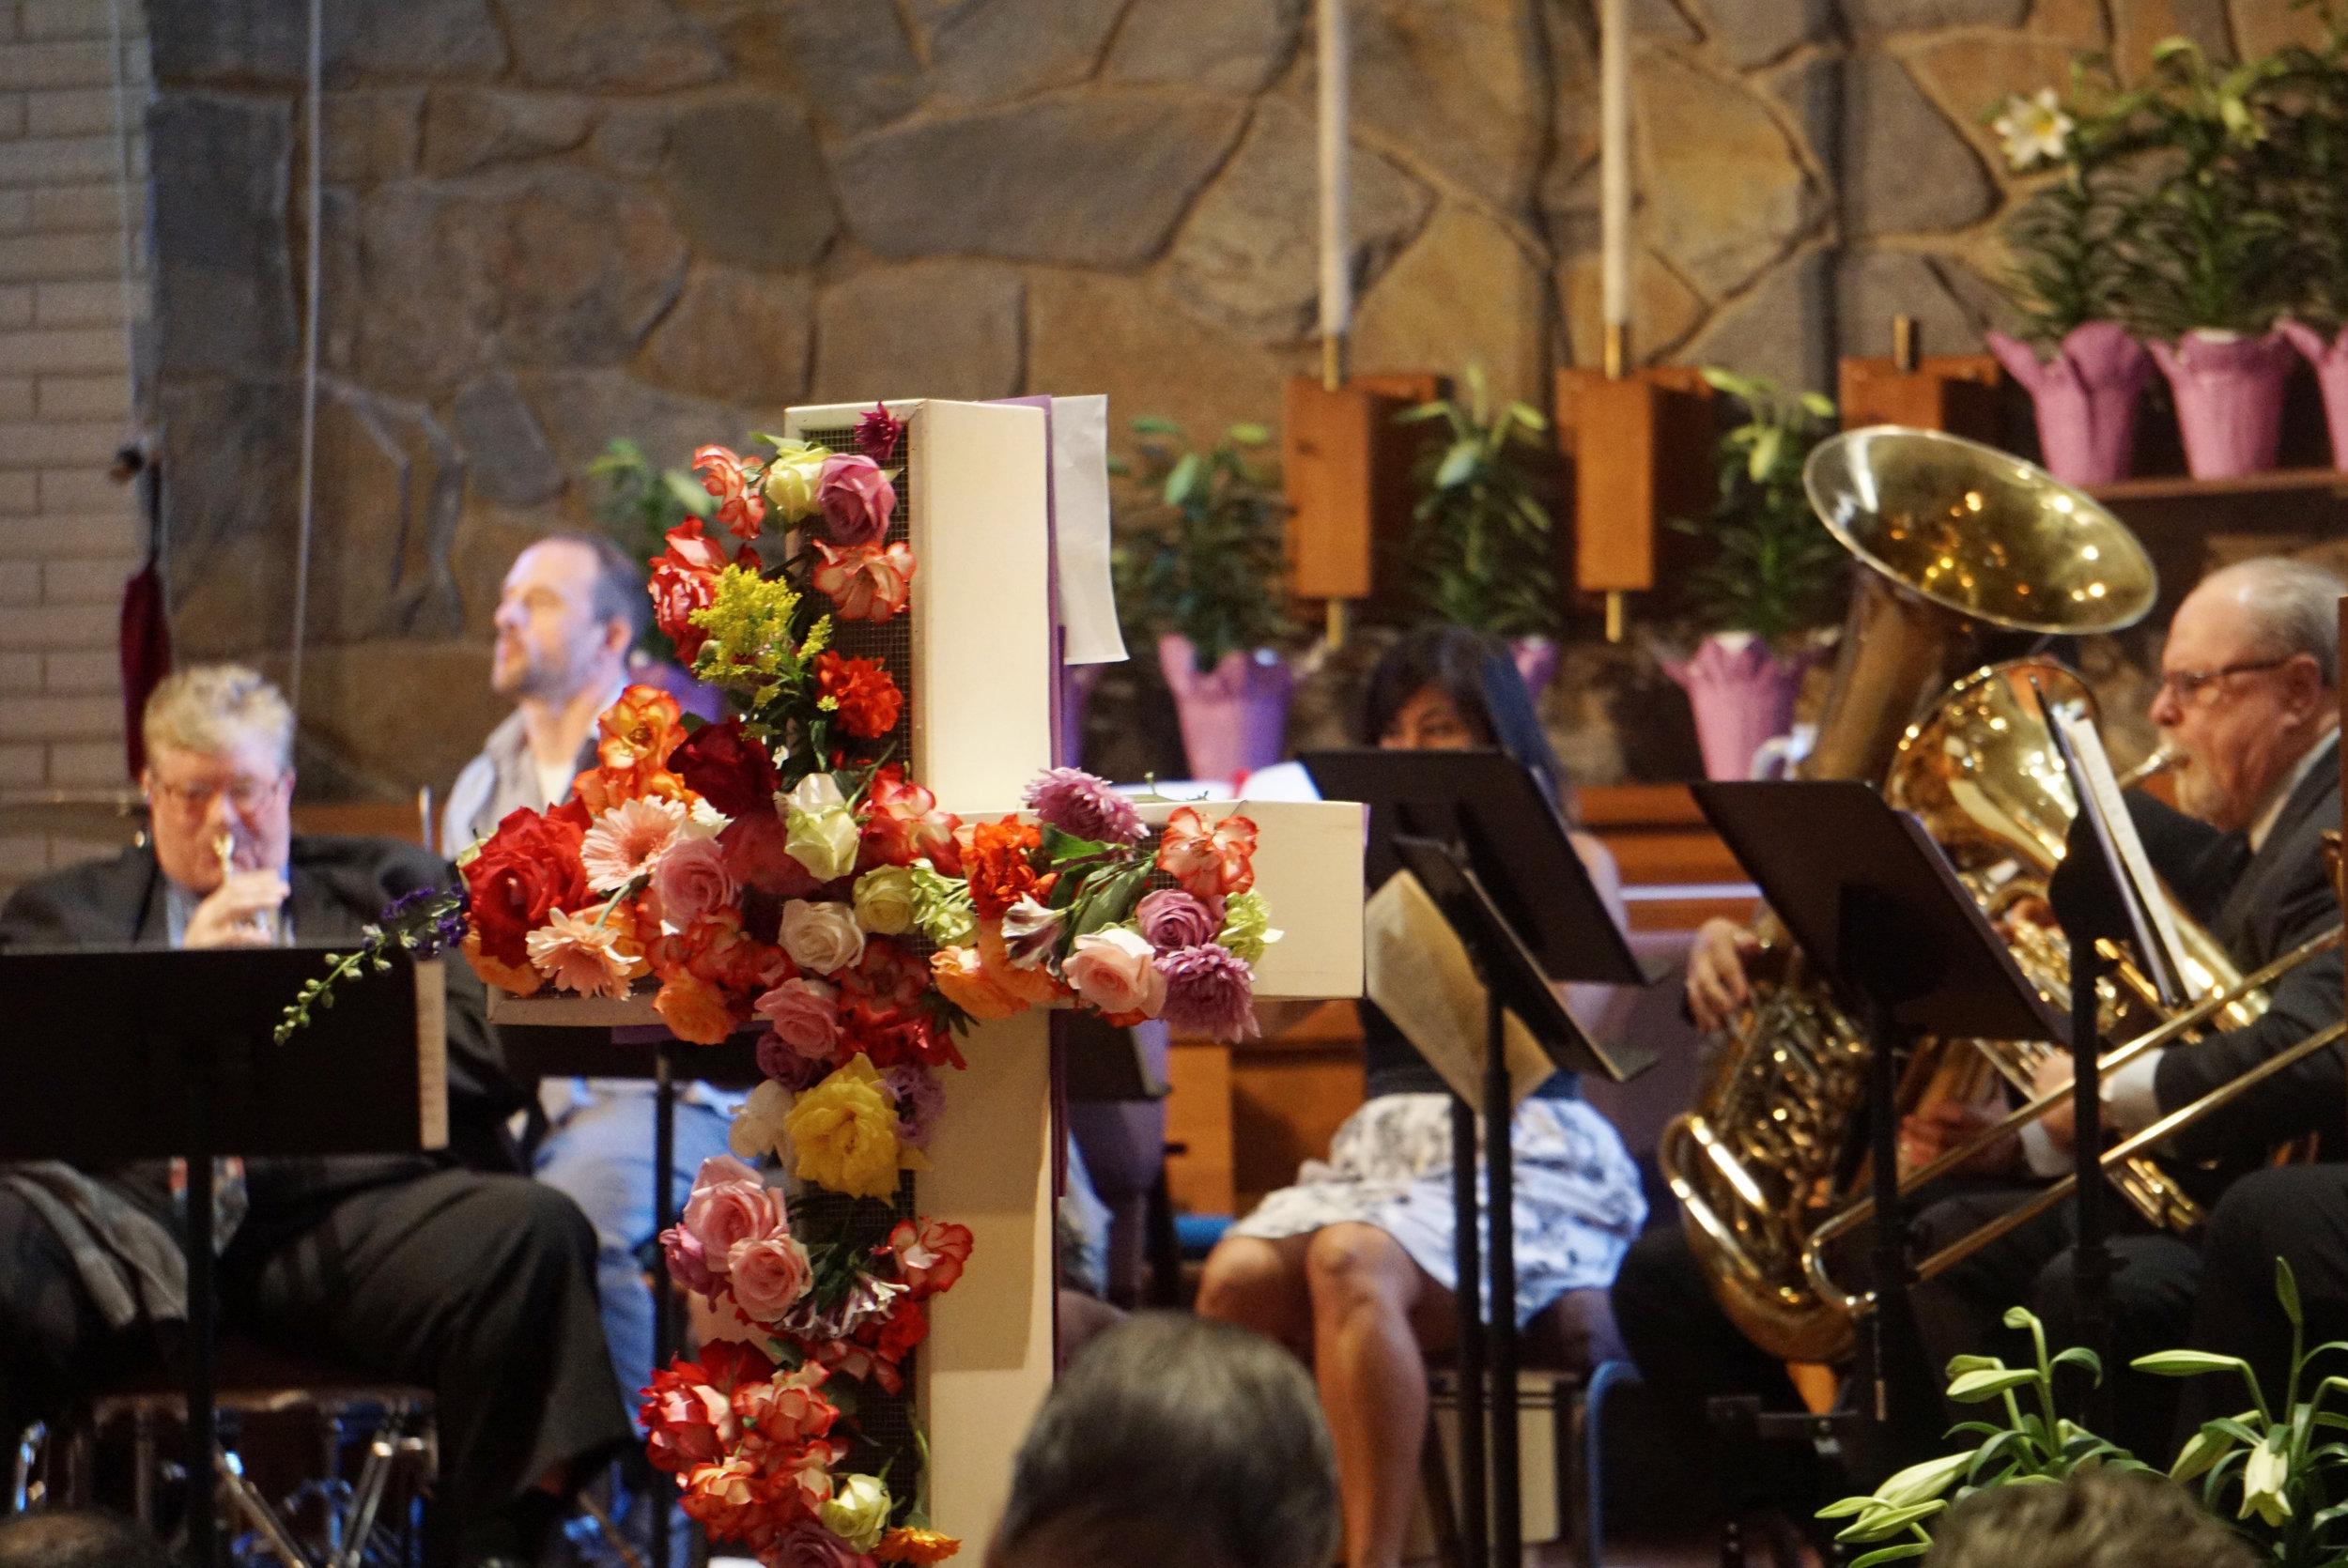 claremont-presbyterian-church-easter-cross-3.jpg